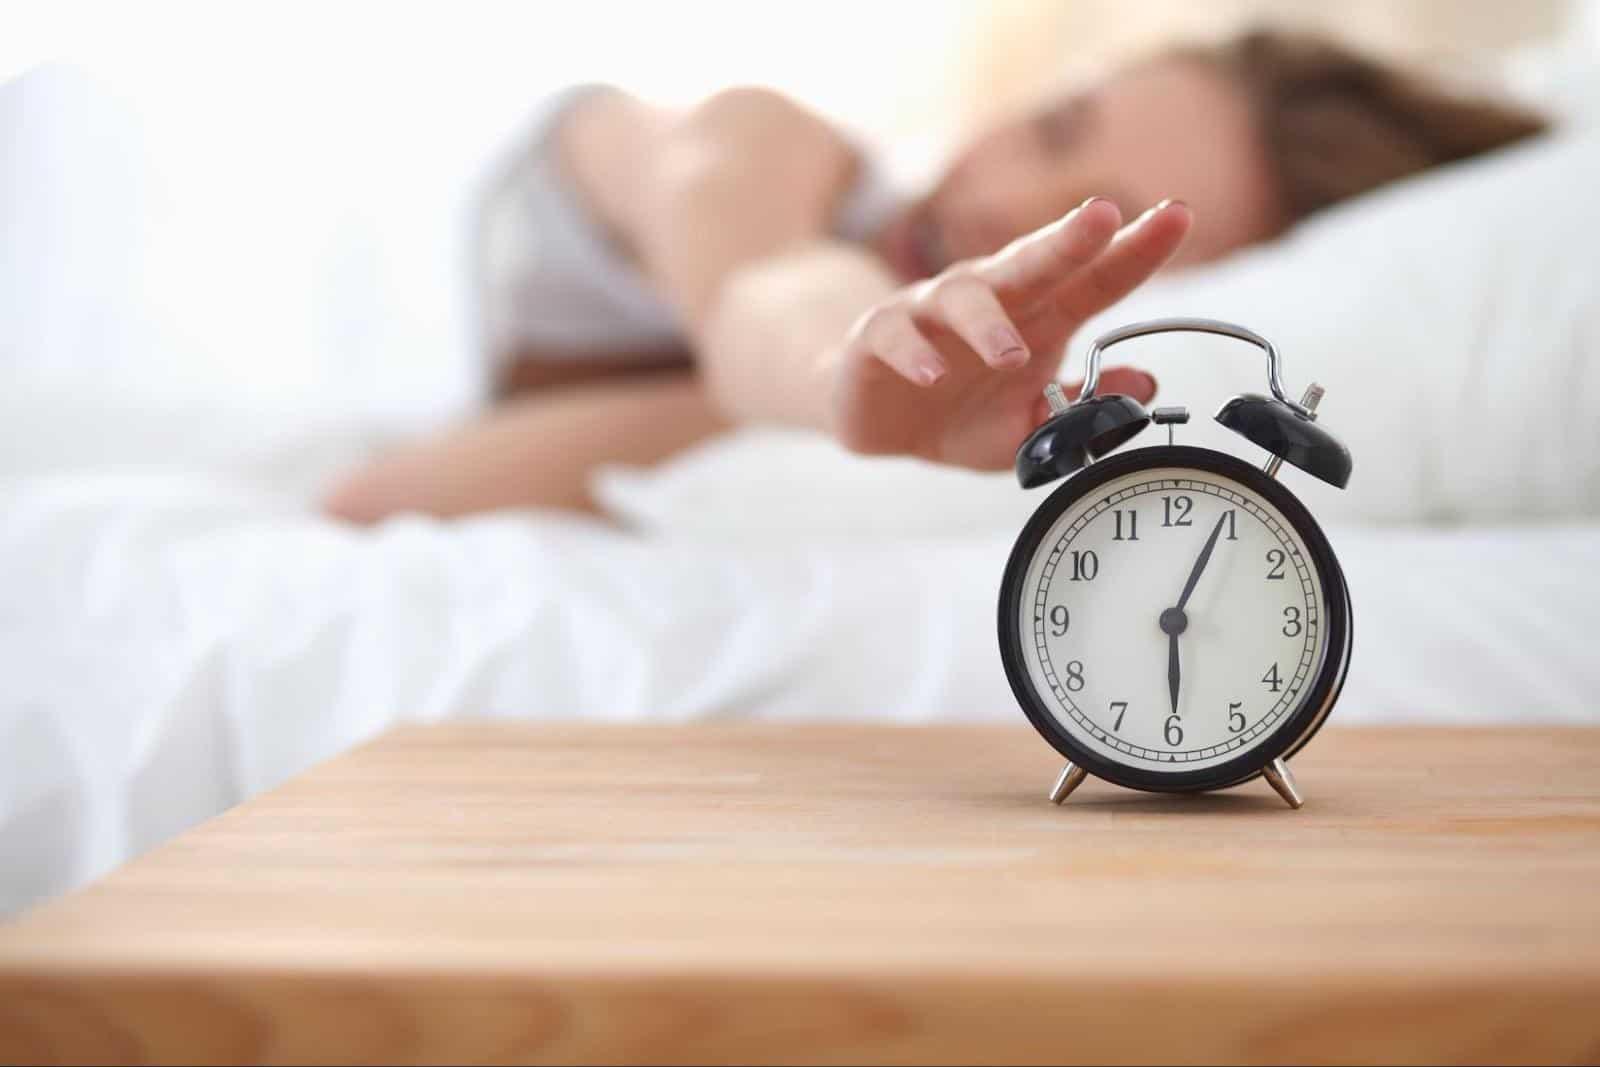 poor sleep hygiene: woman touching the alarm clock